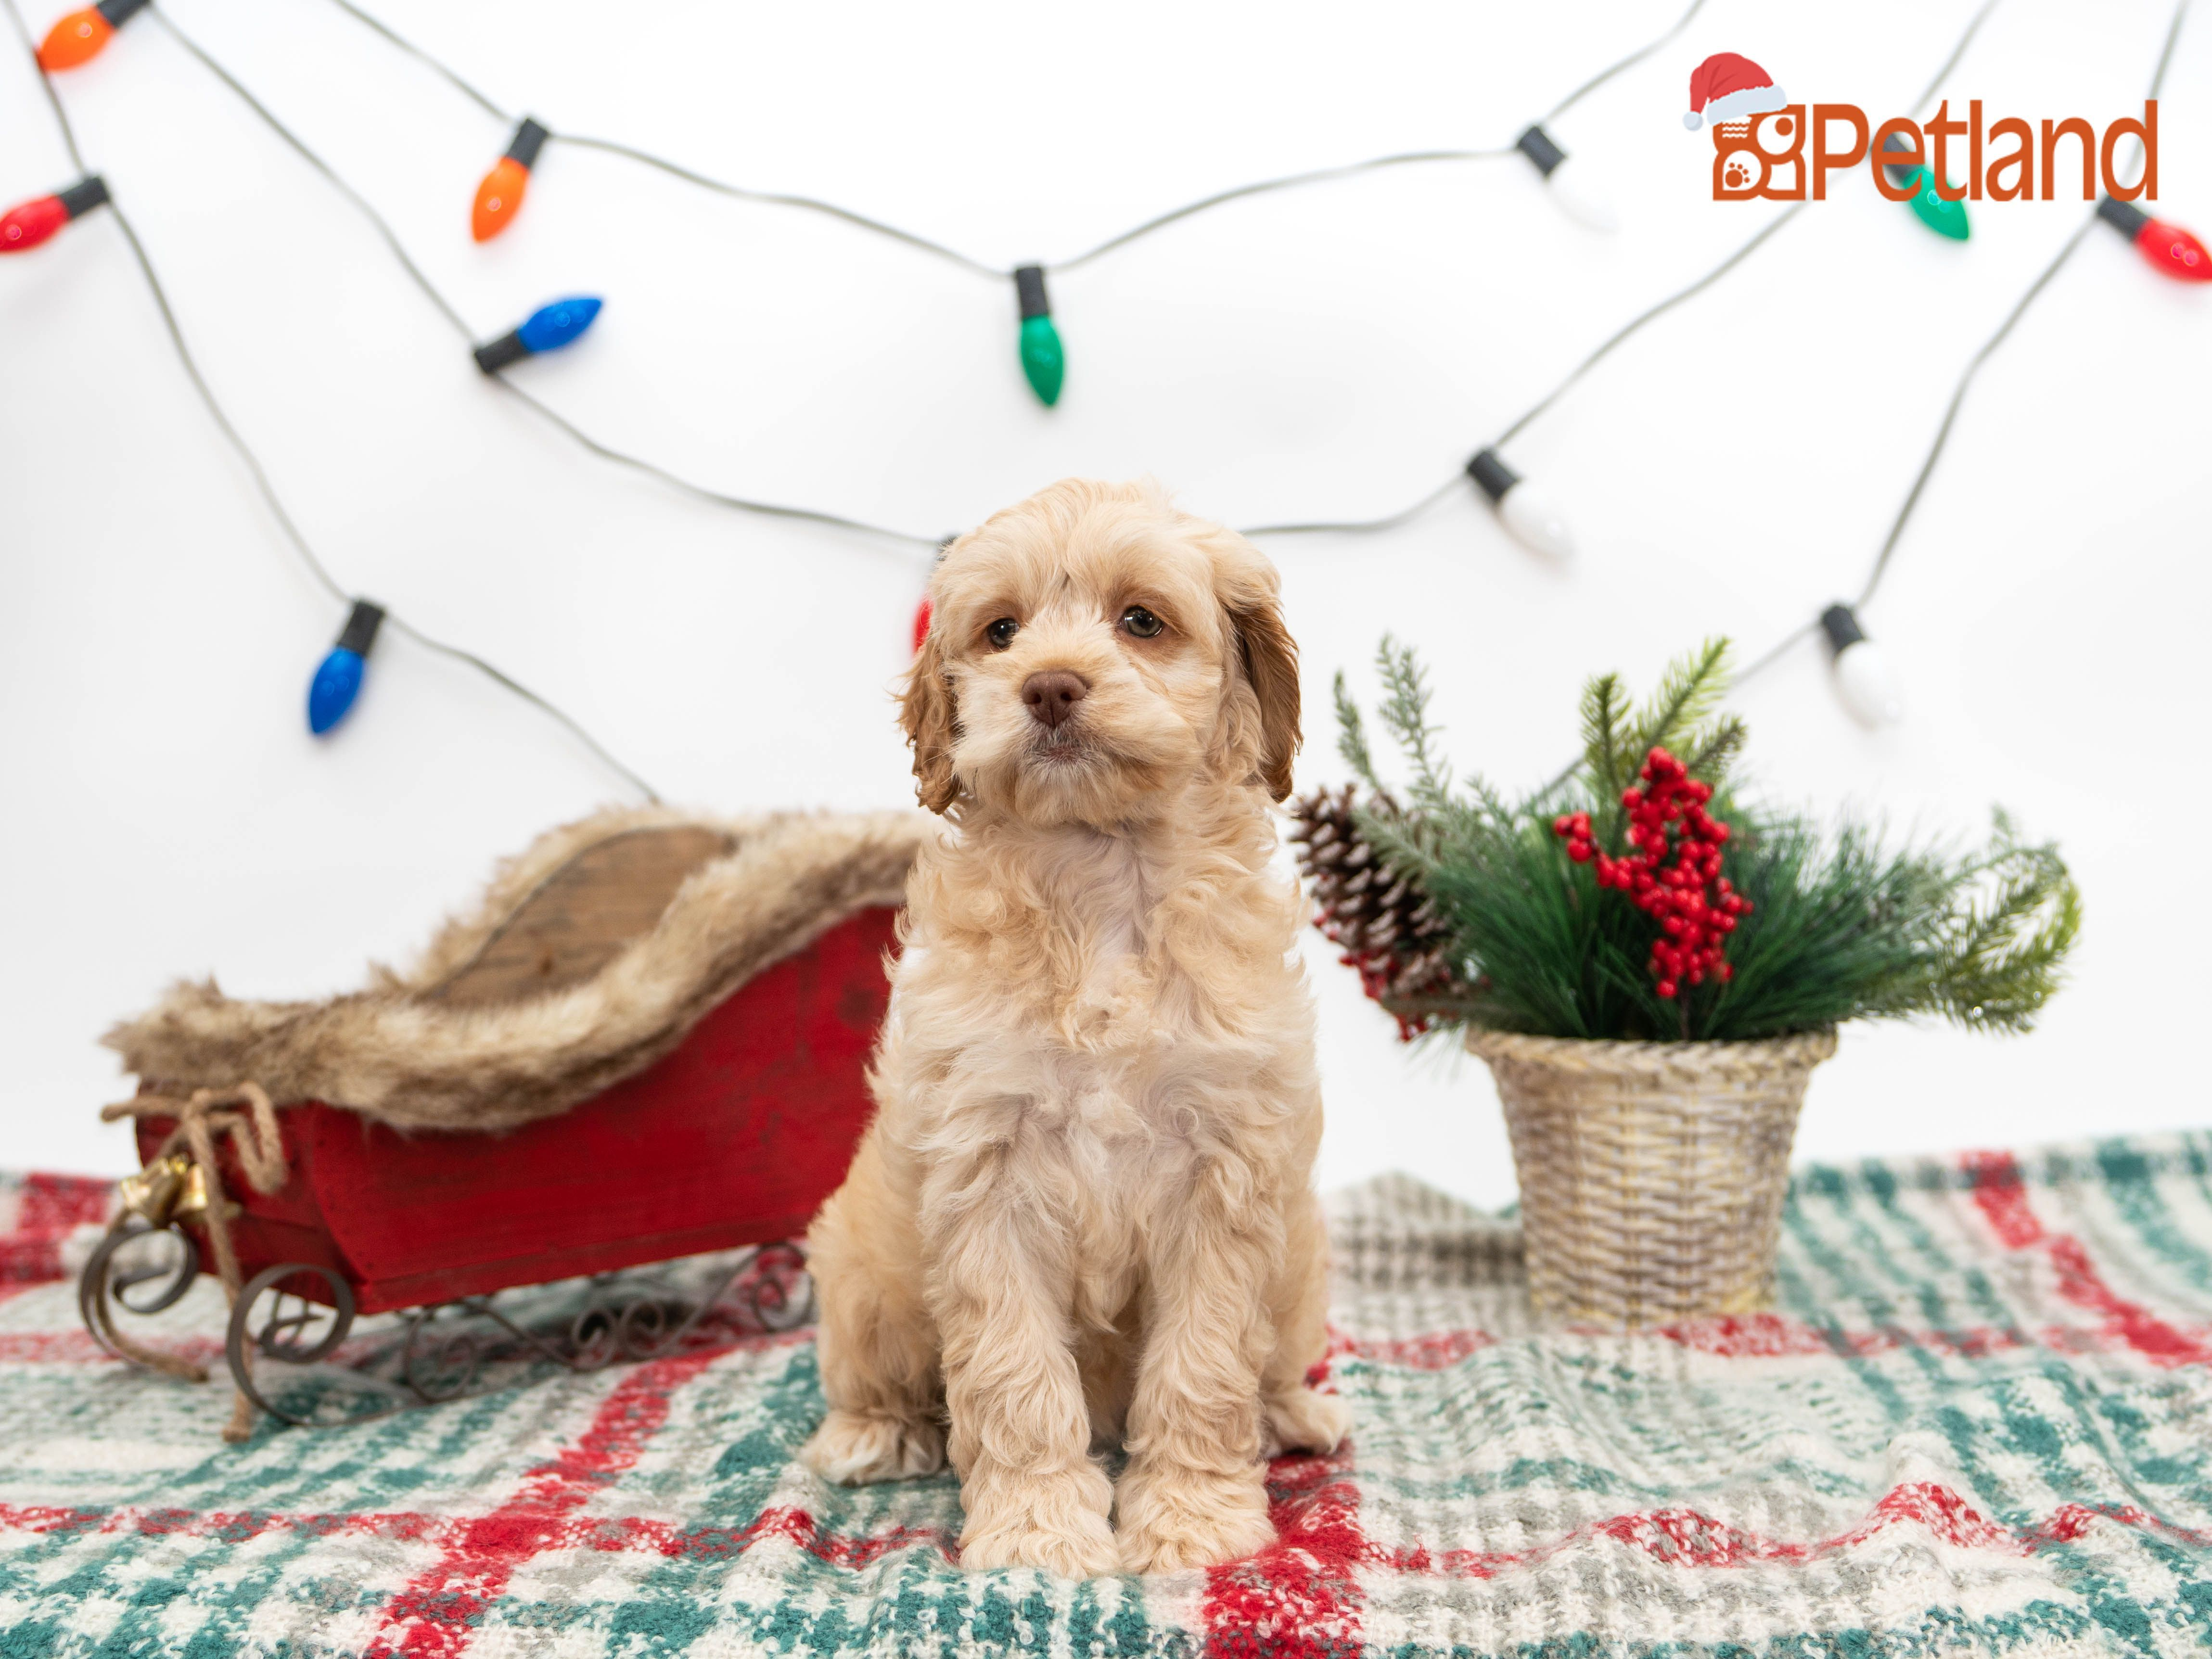 Puppies For Sale Cockapoo Puppies For Sale Cockapoo Puppies Cute Animals